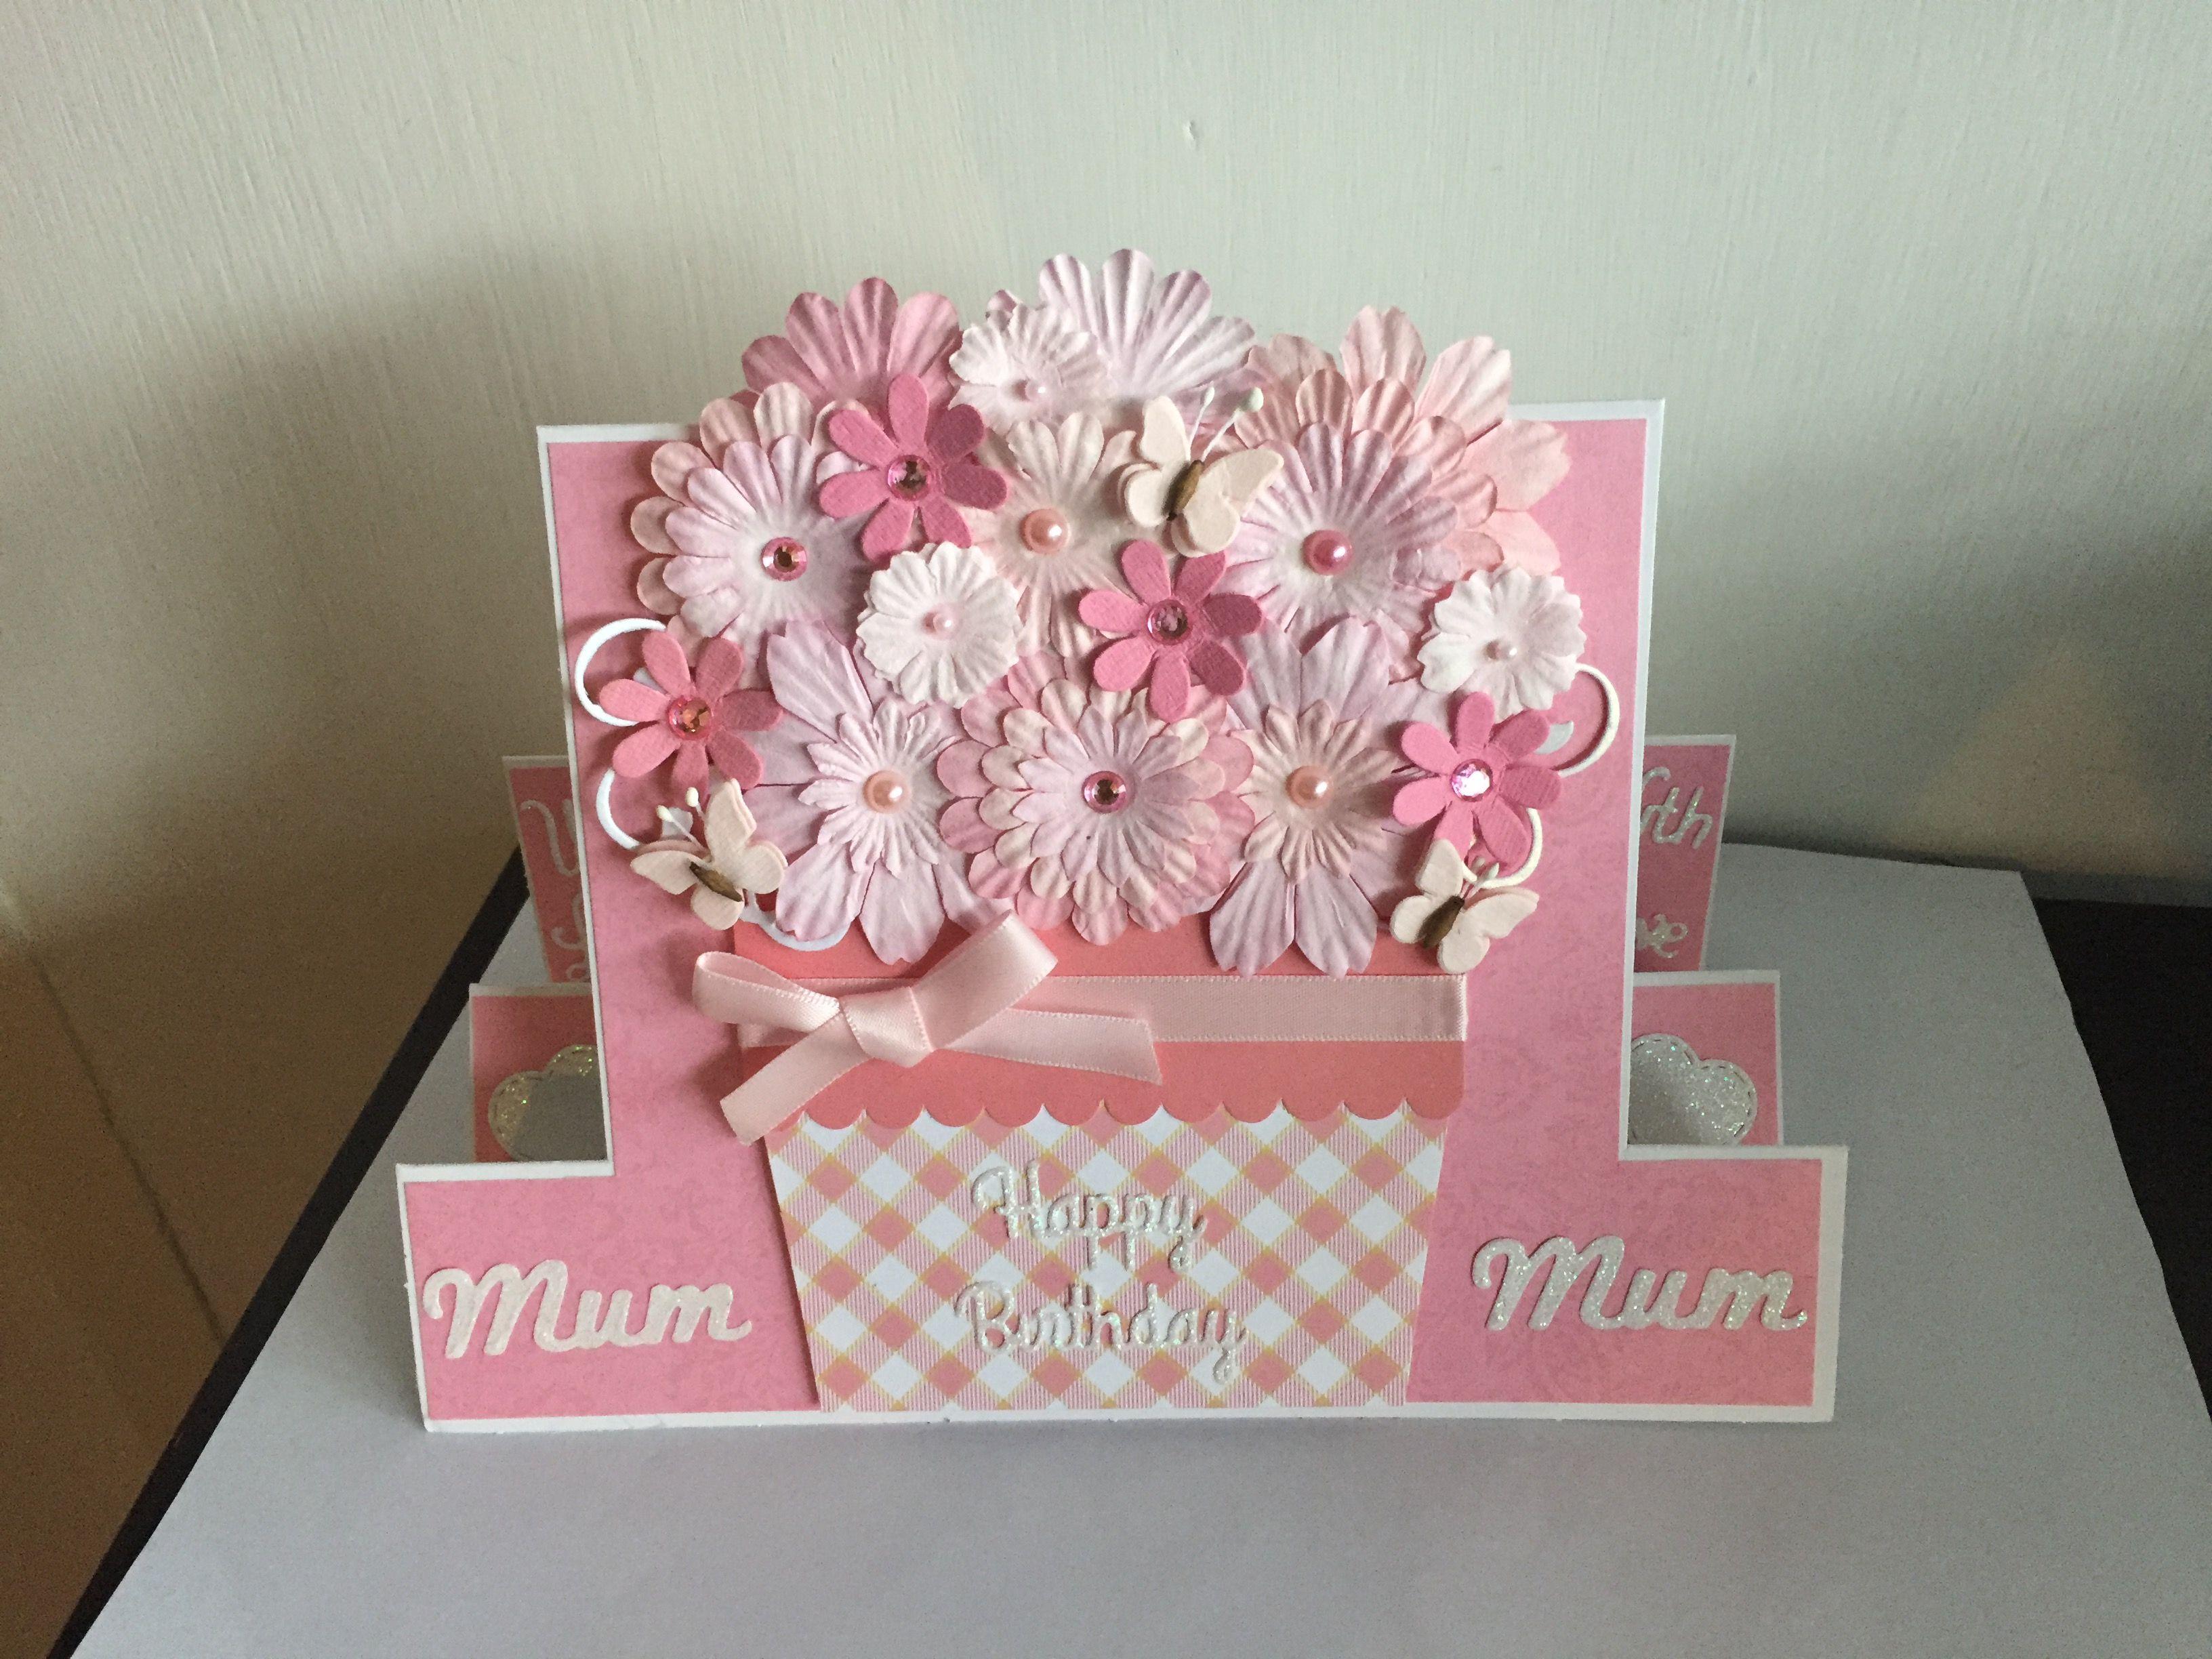 Birthday card flowers mum diy cards pinterest cards and diy cards birthday card flowers mum izmirmasajfo Choice Image